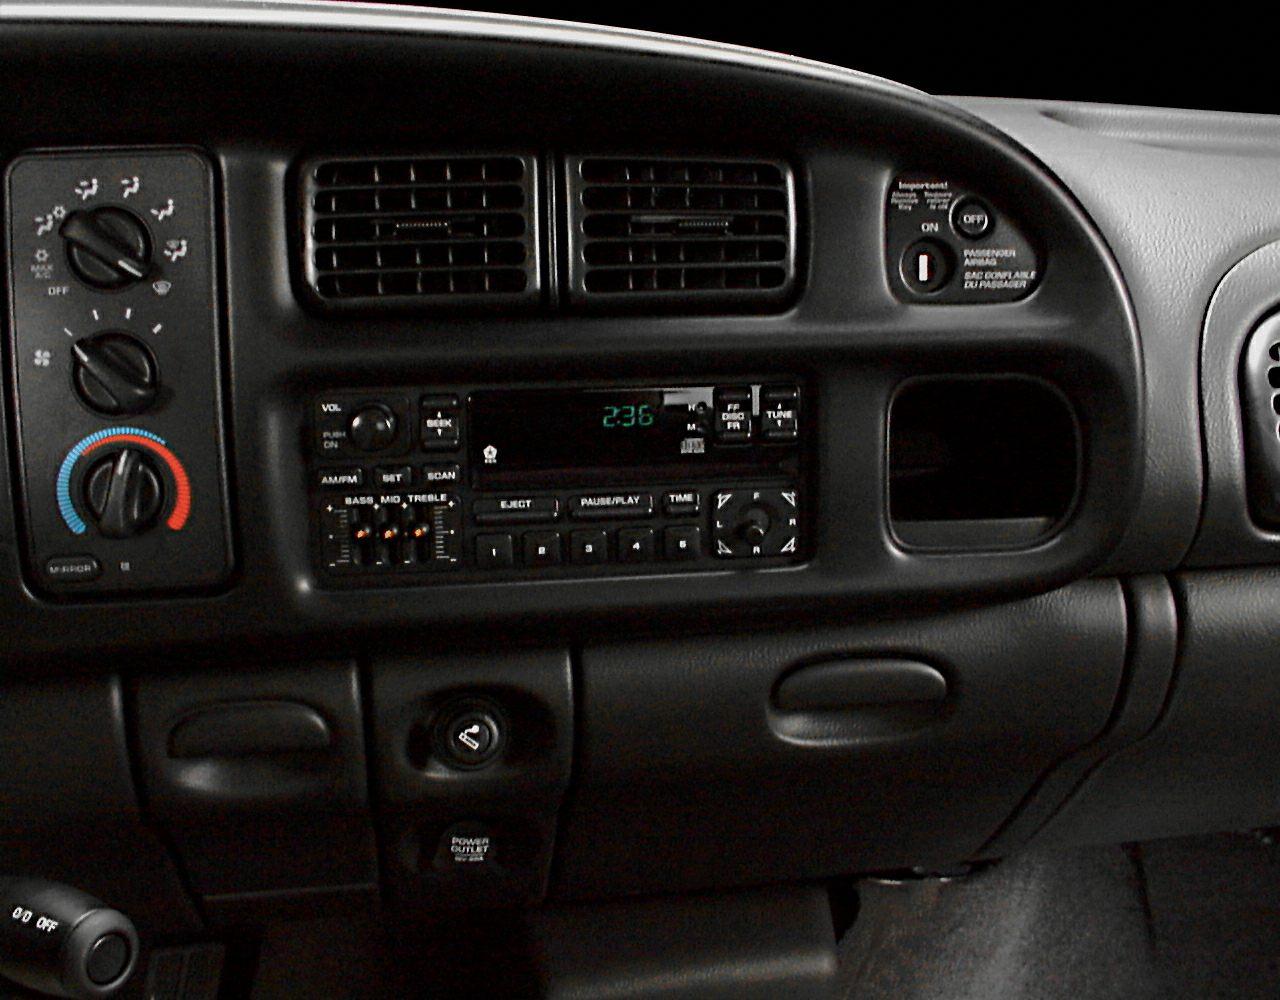 2000 Dodge Ram 1500 Slt 4x4 Regular Cab 118 7 In Wb Pictures